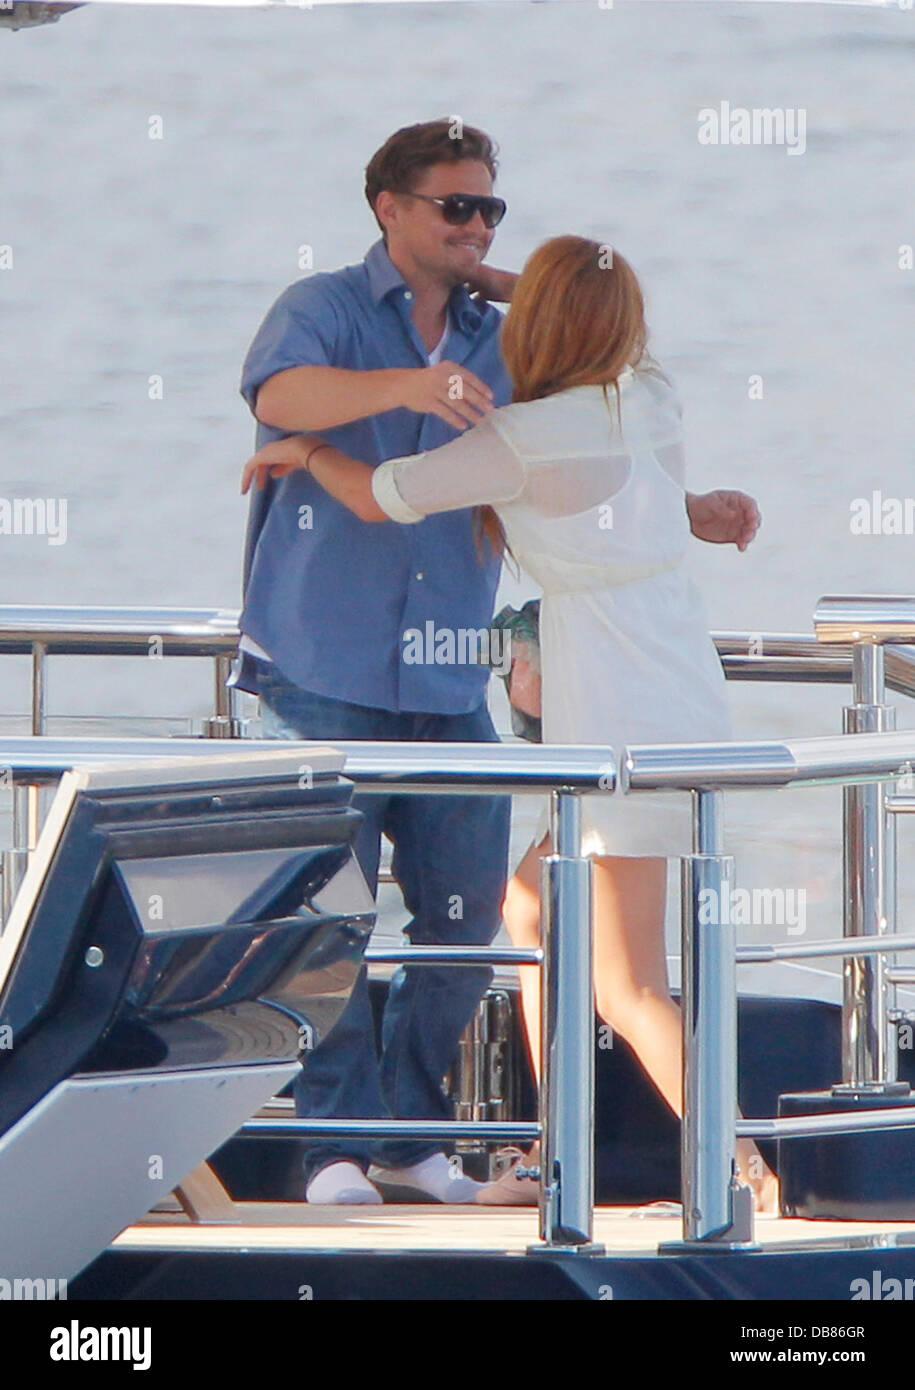 Leonardo Dicaprio Gives Blake Lively A Hug Aboard Steven Spielbergs